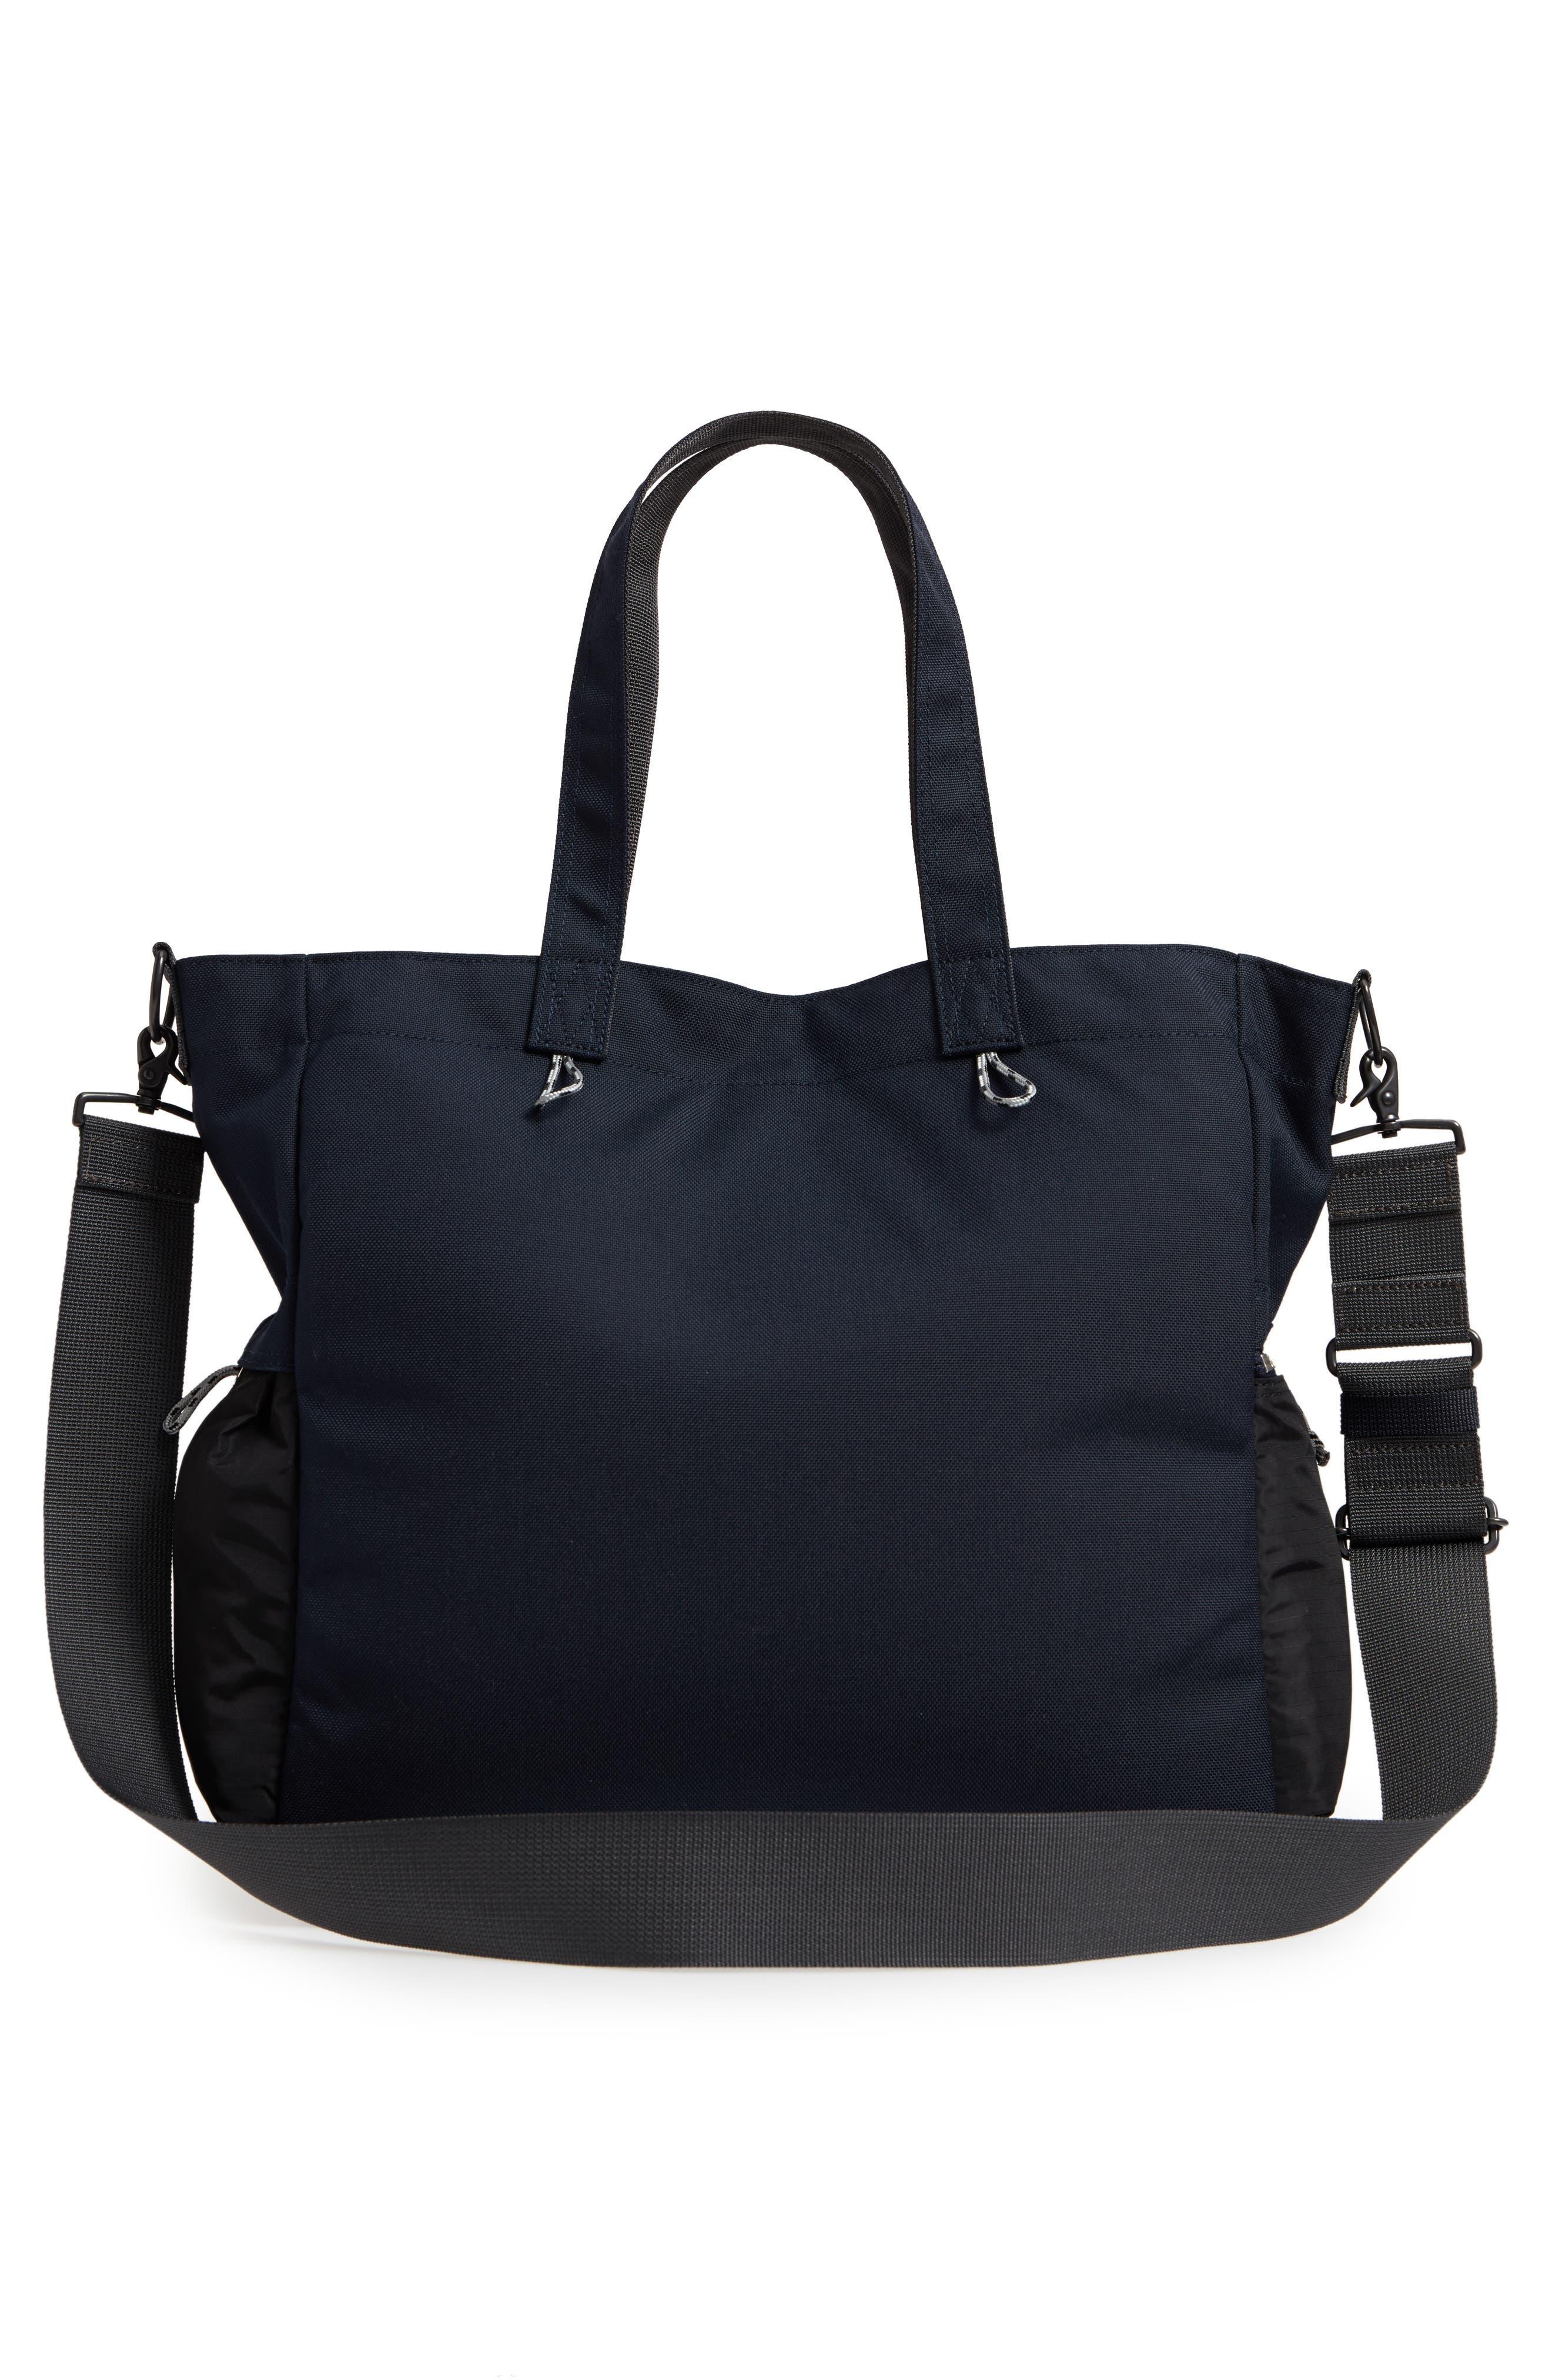 Porter-Yoshida & Co. Hype Tote Bag,                             Alternate thumbnail 3, color,                             400